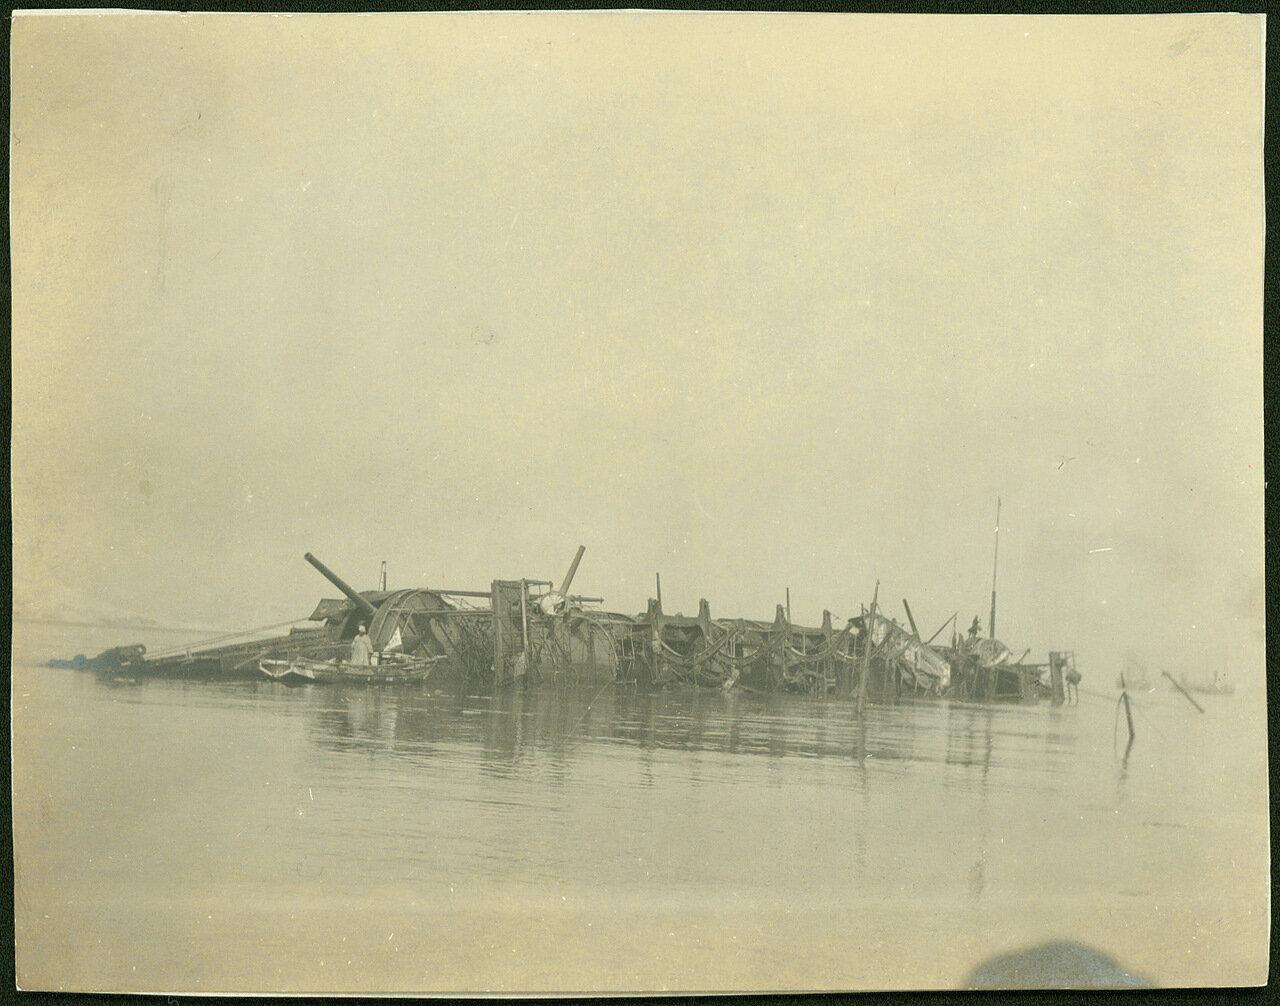 Затопленный крейсер Варяг во время отлива